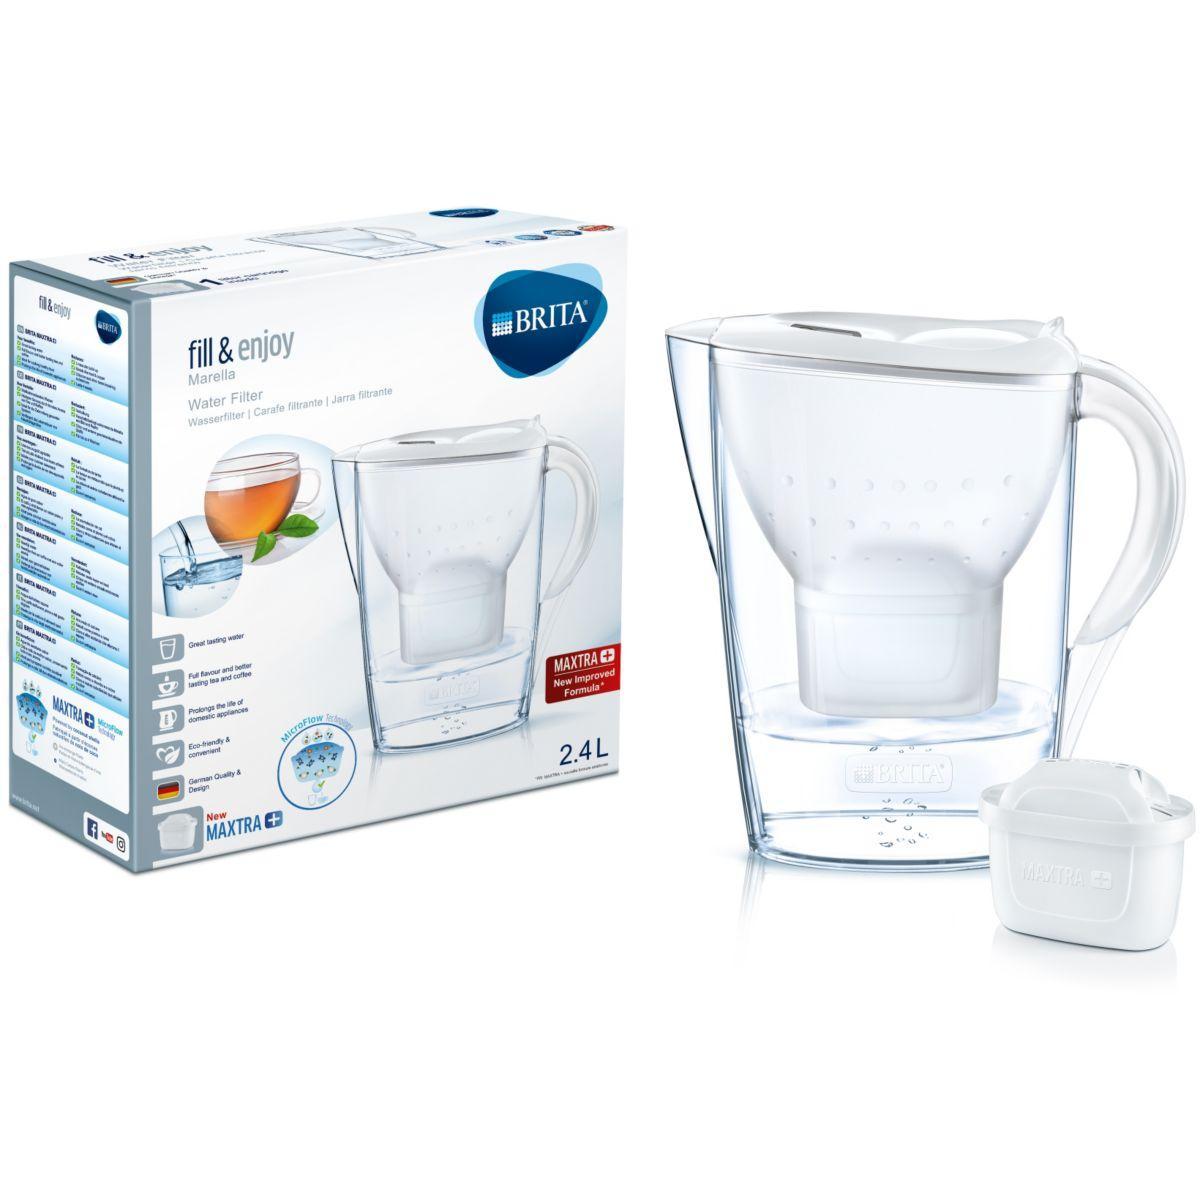 Image of BRITA Marella Filtre à eau pour carafe 2.4L Blanc